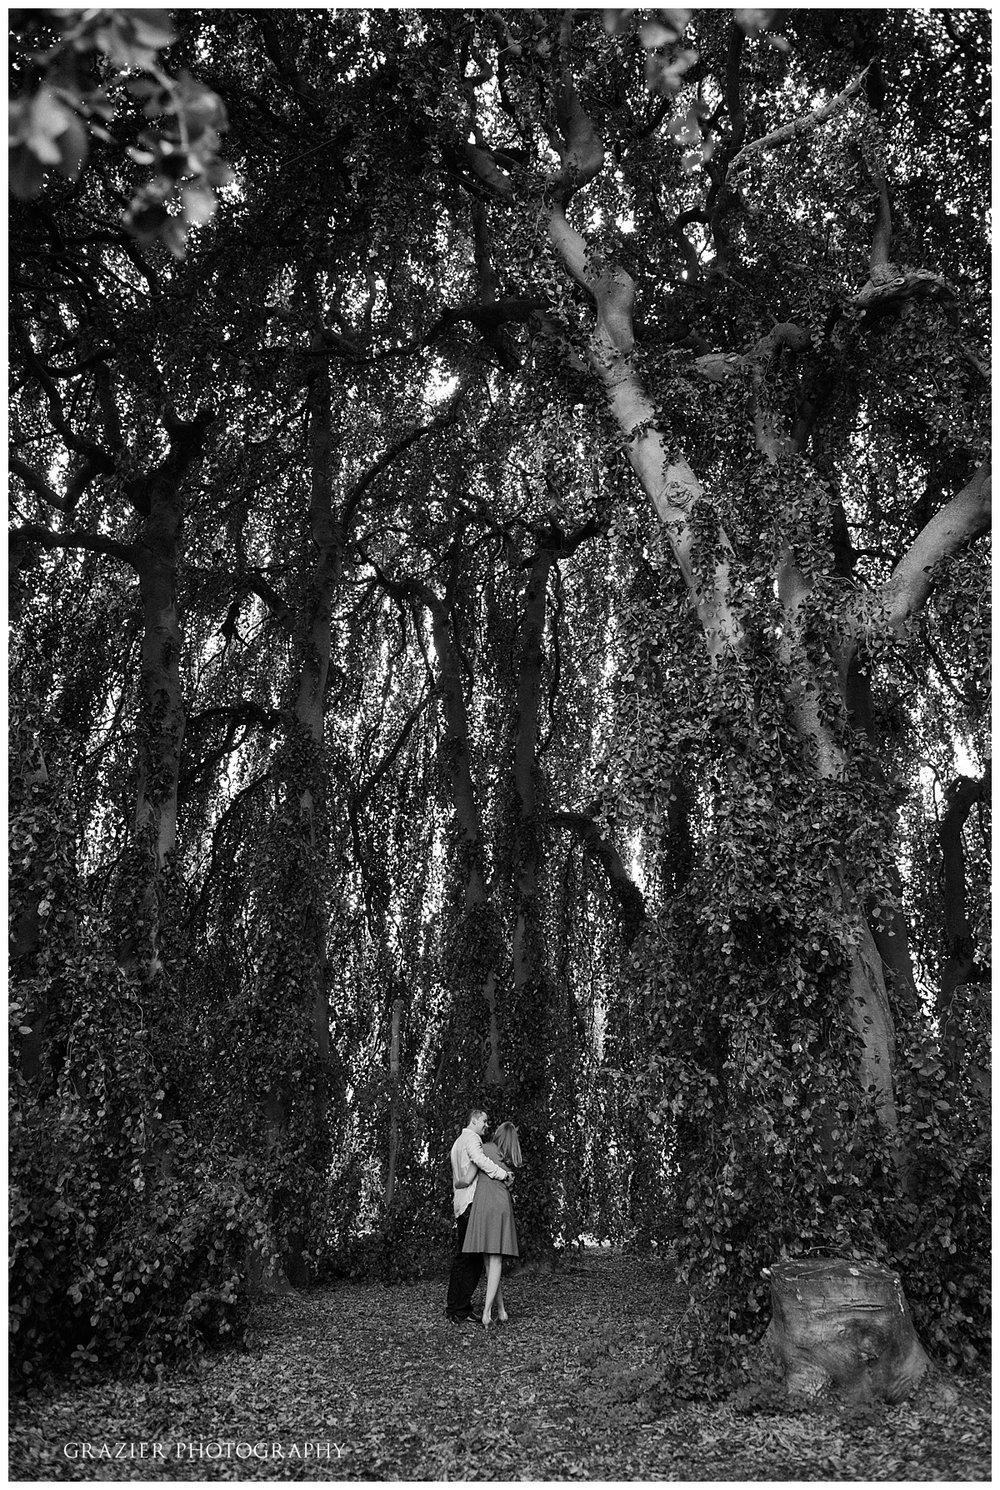 Boston Engagement Wedding Grazier Photography 180623-1_WEB.jpg